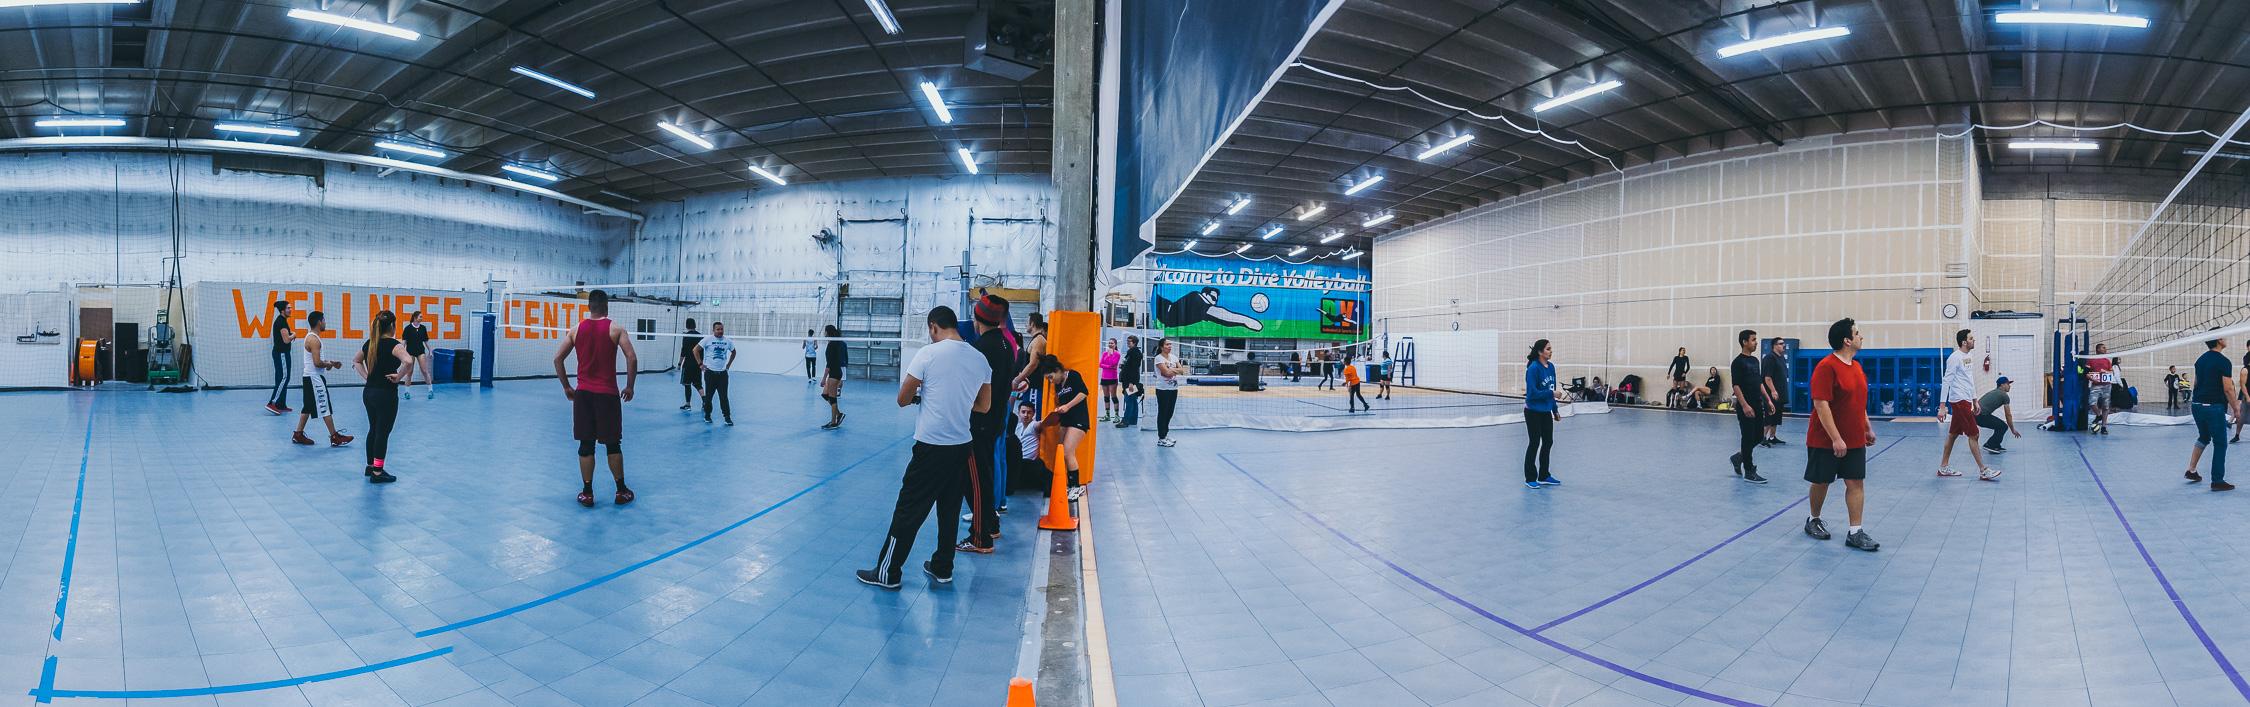 Volleyball Latino - Casa de paz - Another Look